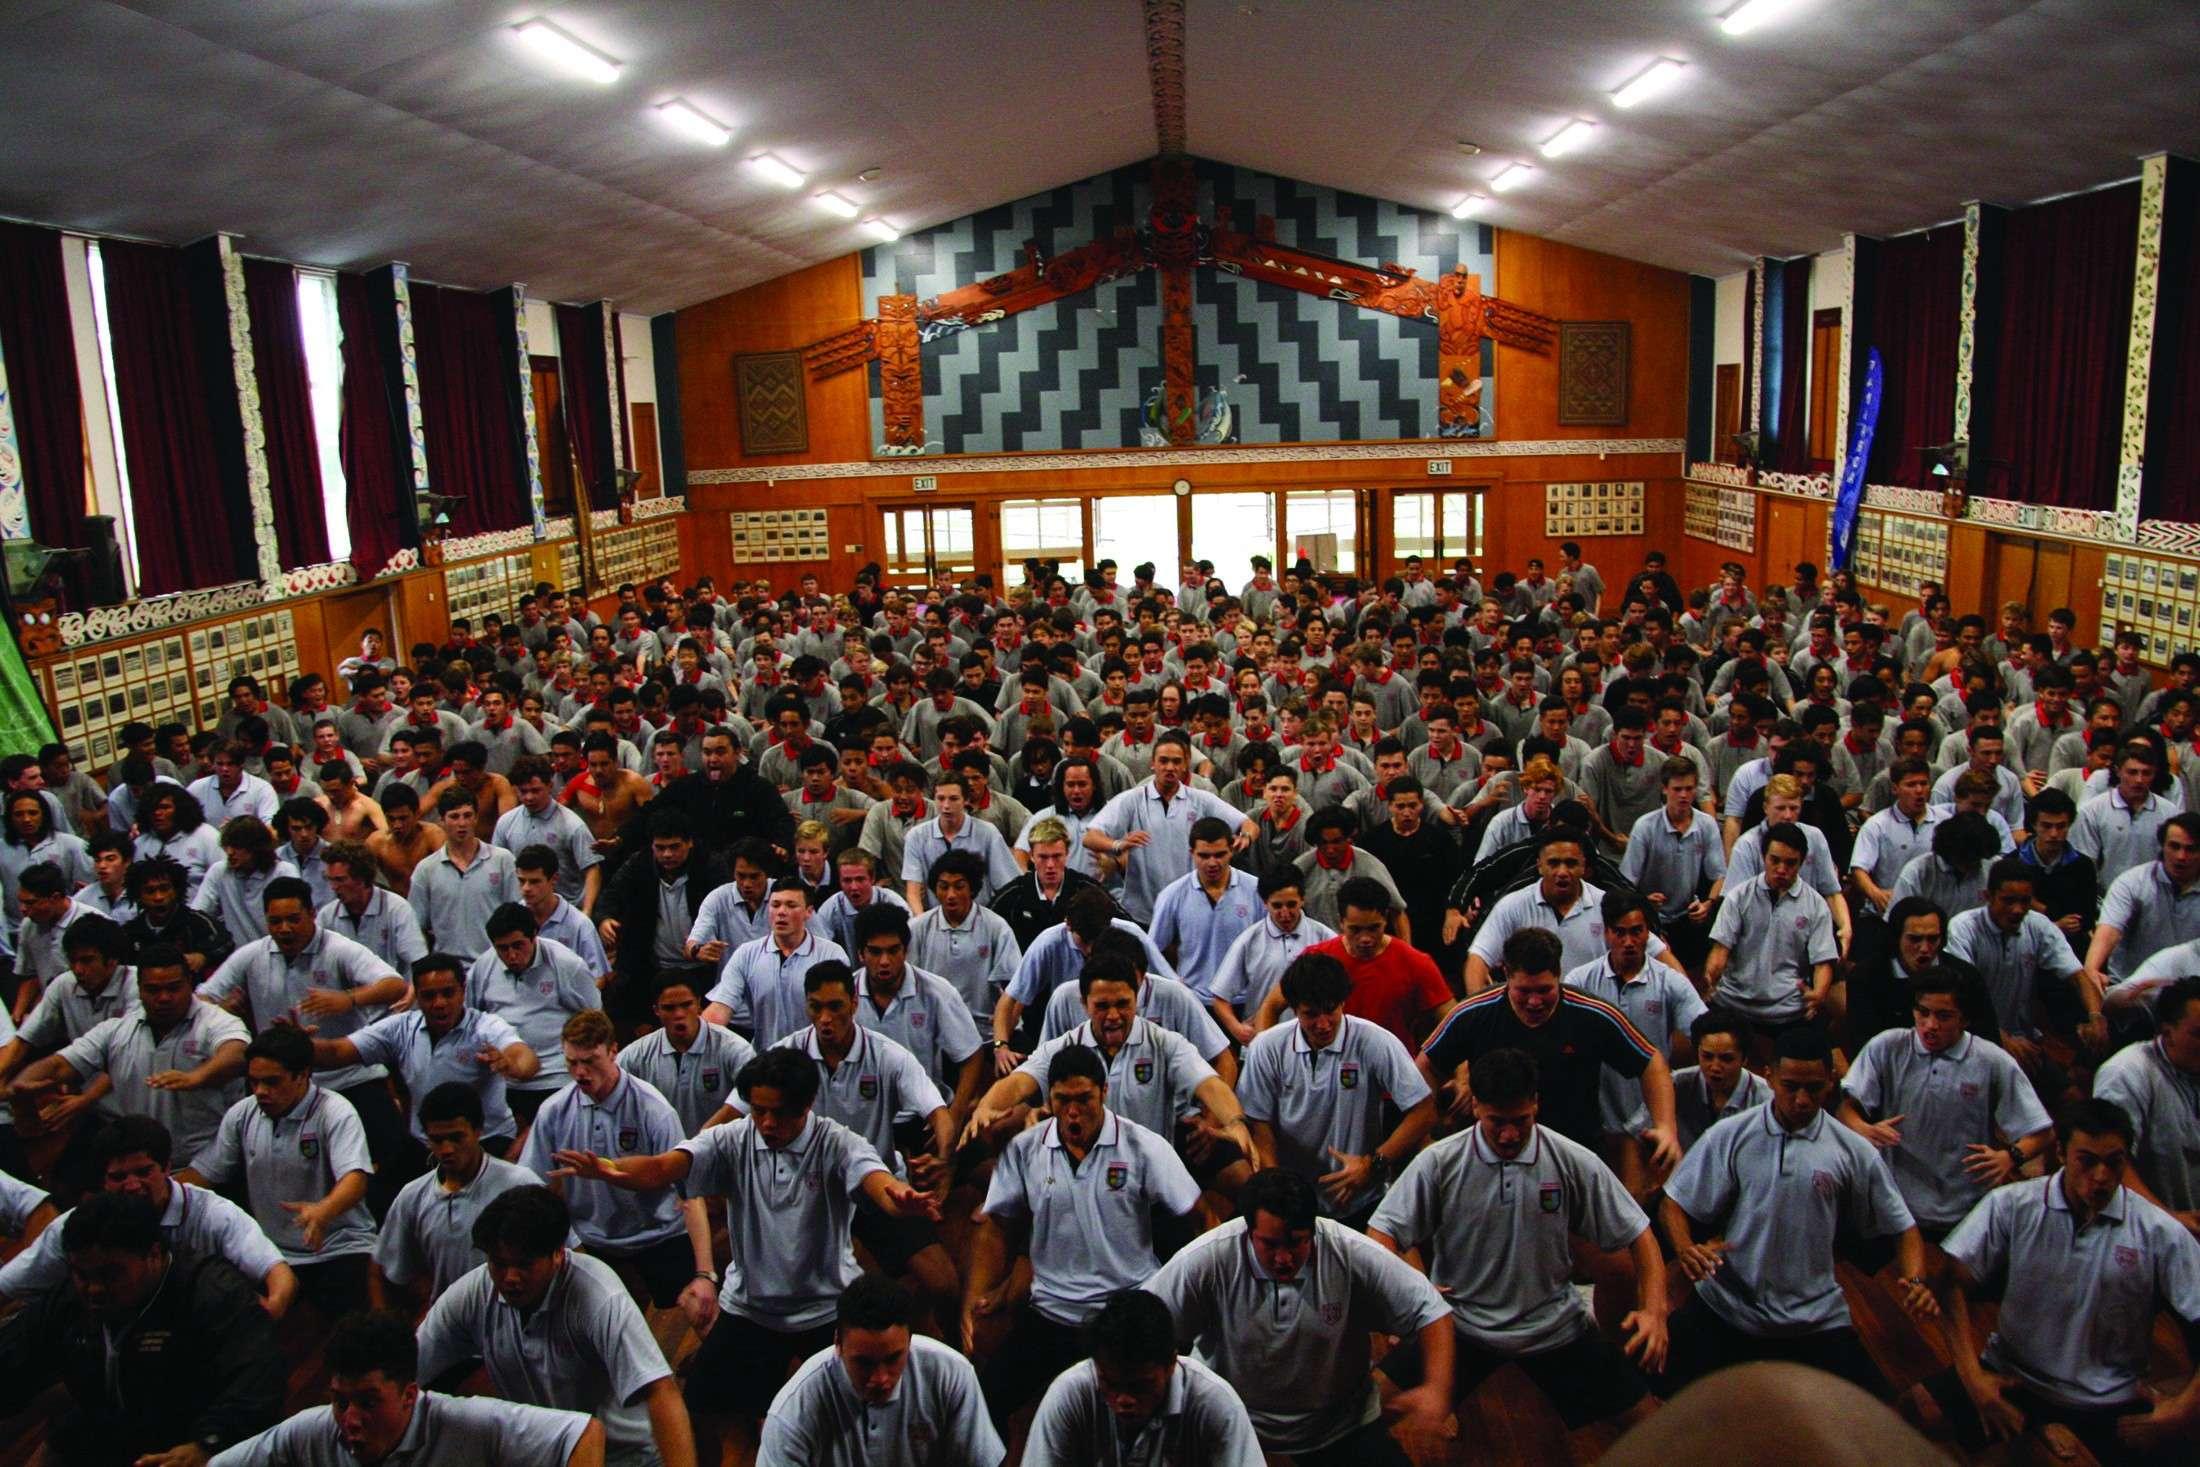 Hakaassembly Gisborne Boys' High School